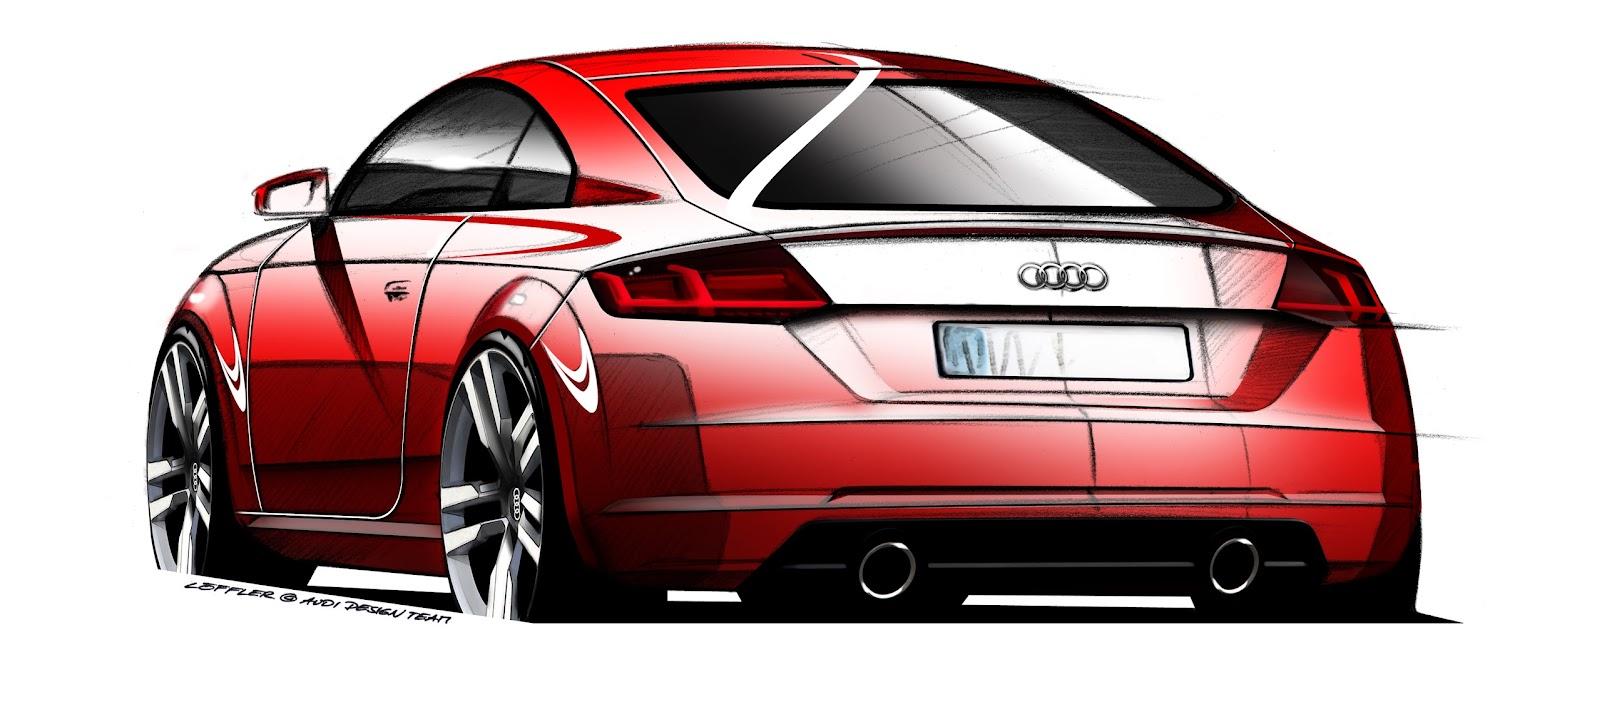 [Resim: Yeni-Audi-TT-2015-2.jpg]